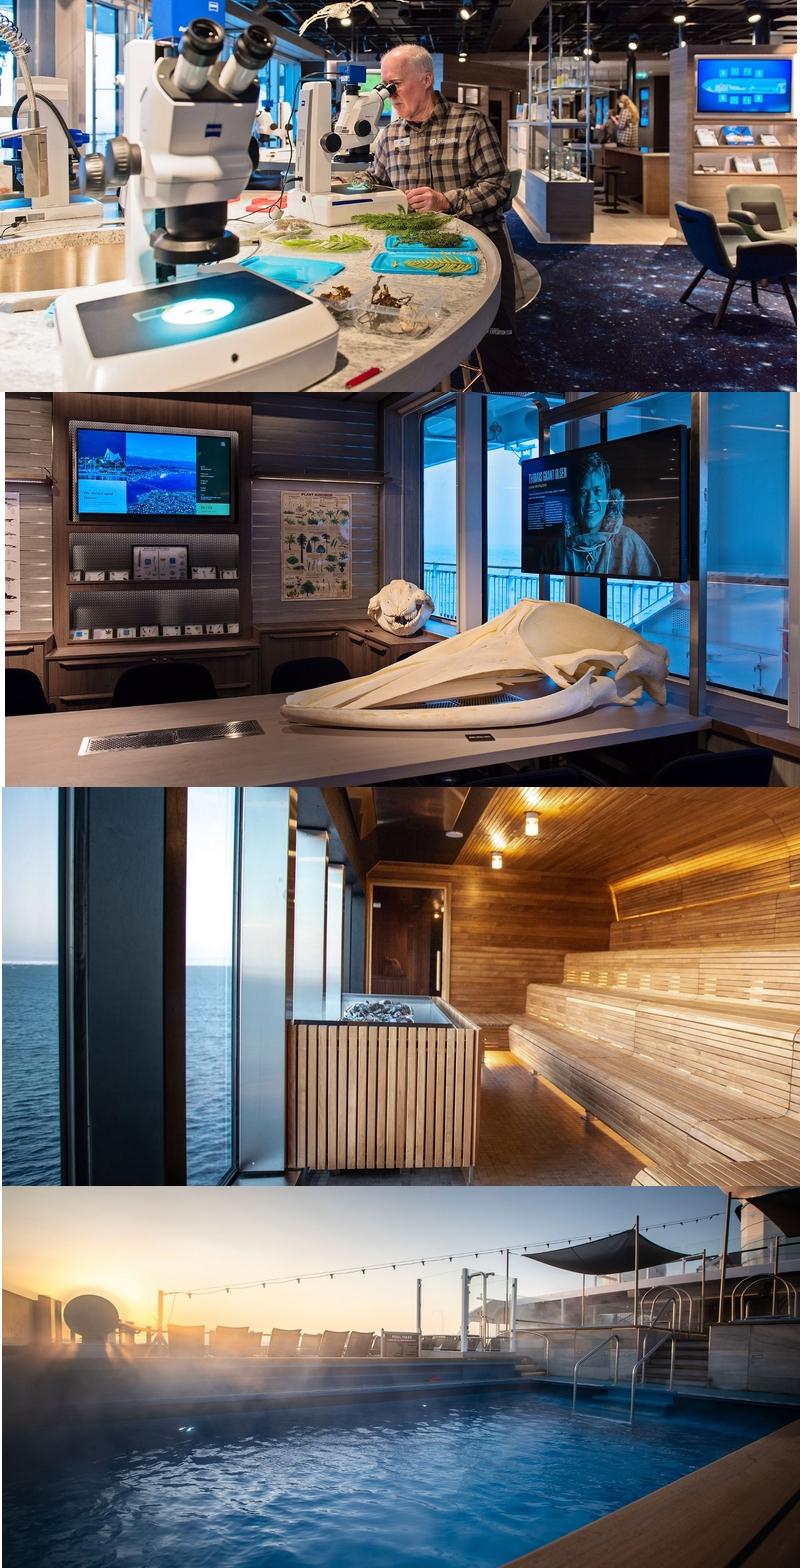 MS Roald Amundsen Cruise Ship Interior 3